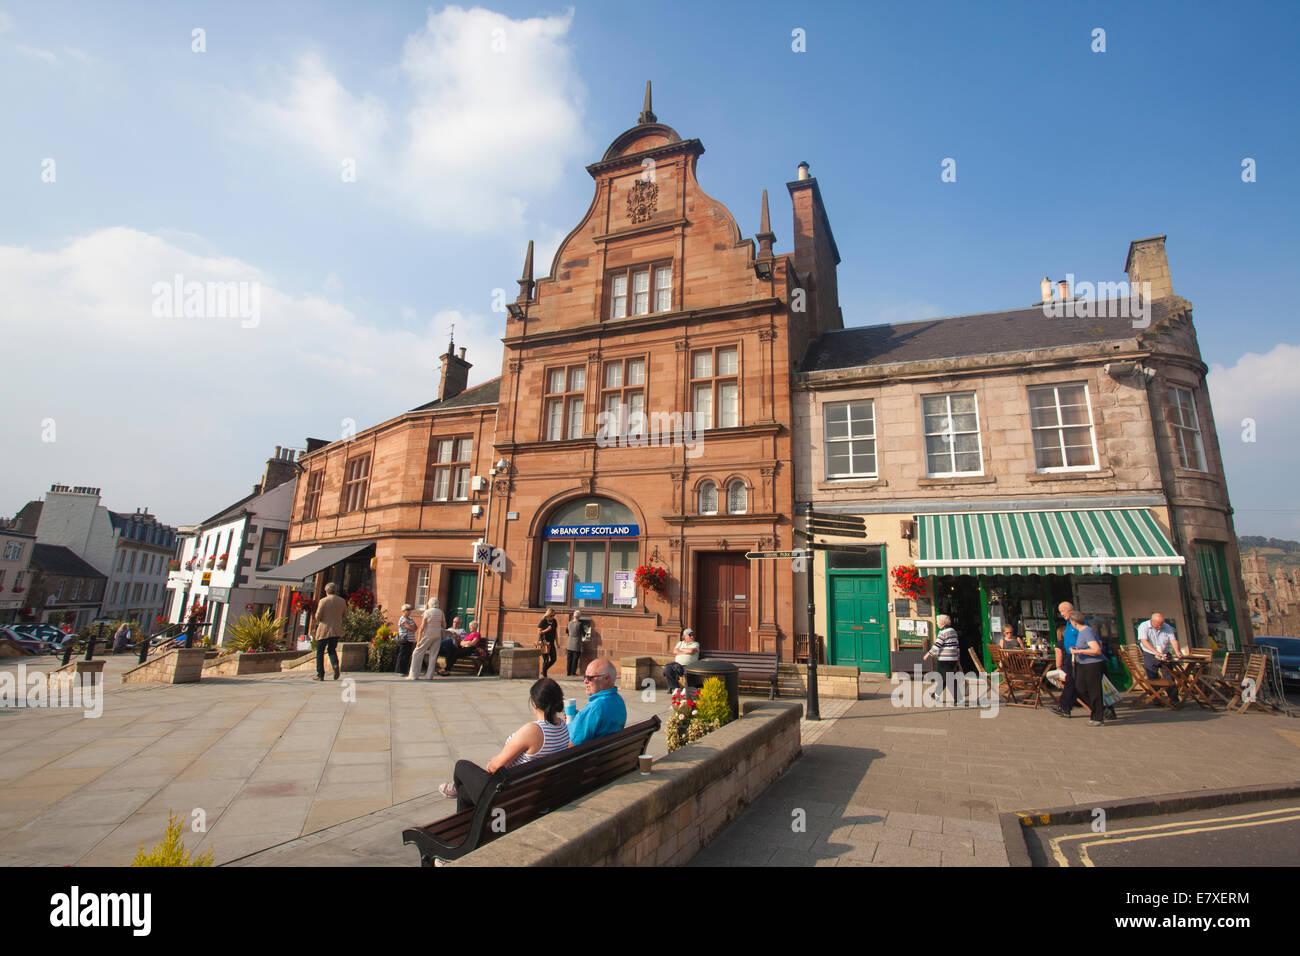 Market Square, Melrose pretty market town in the Scottish Borders, Roxburghshire, Scotland, United Kingdom - Stock Image